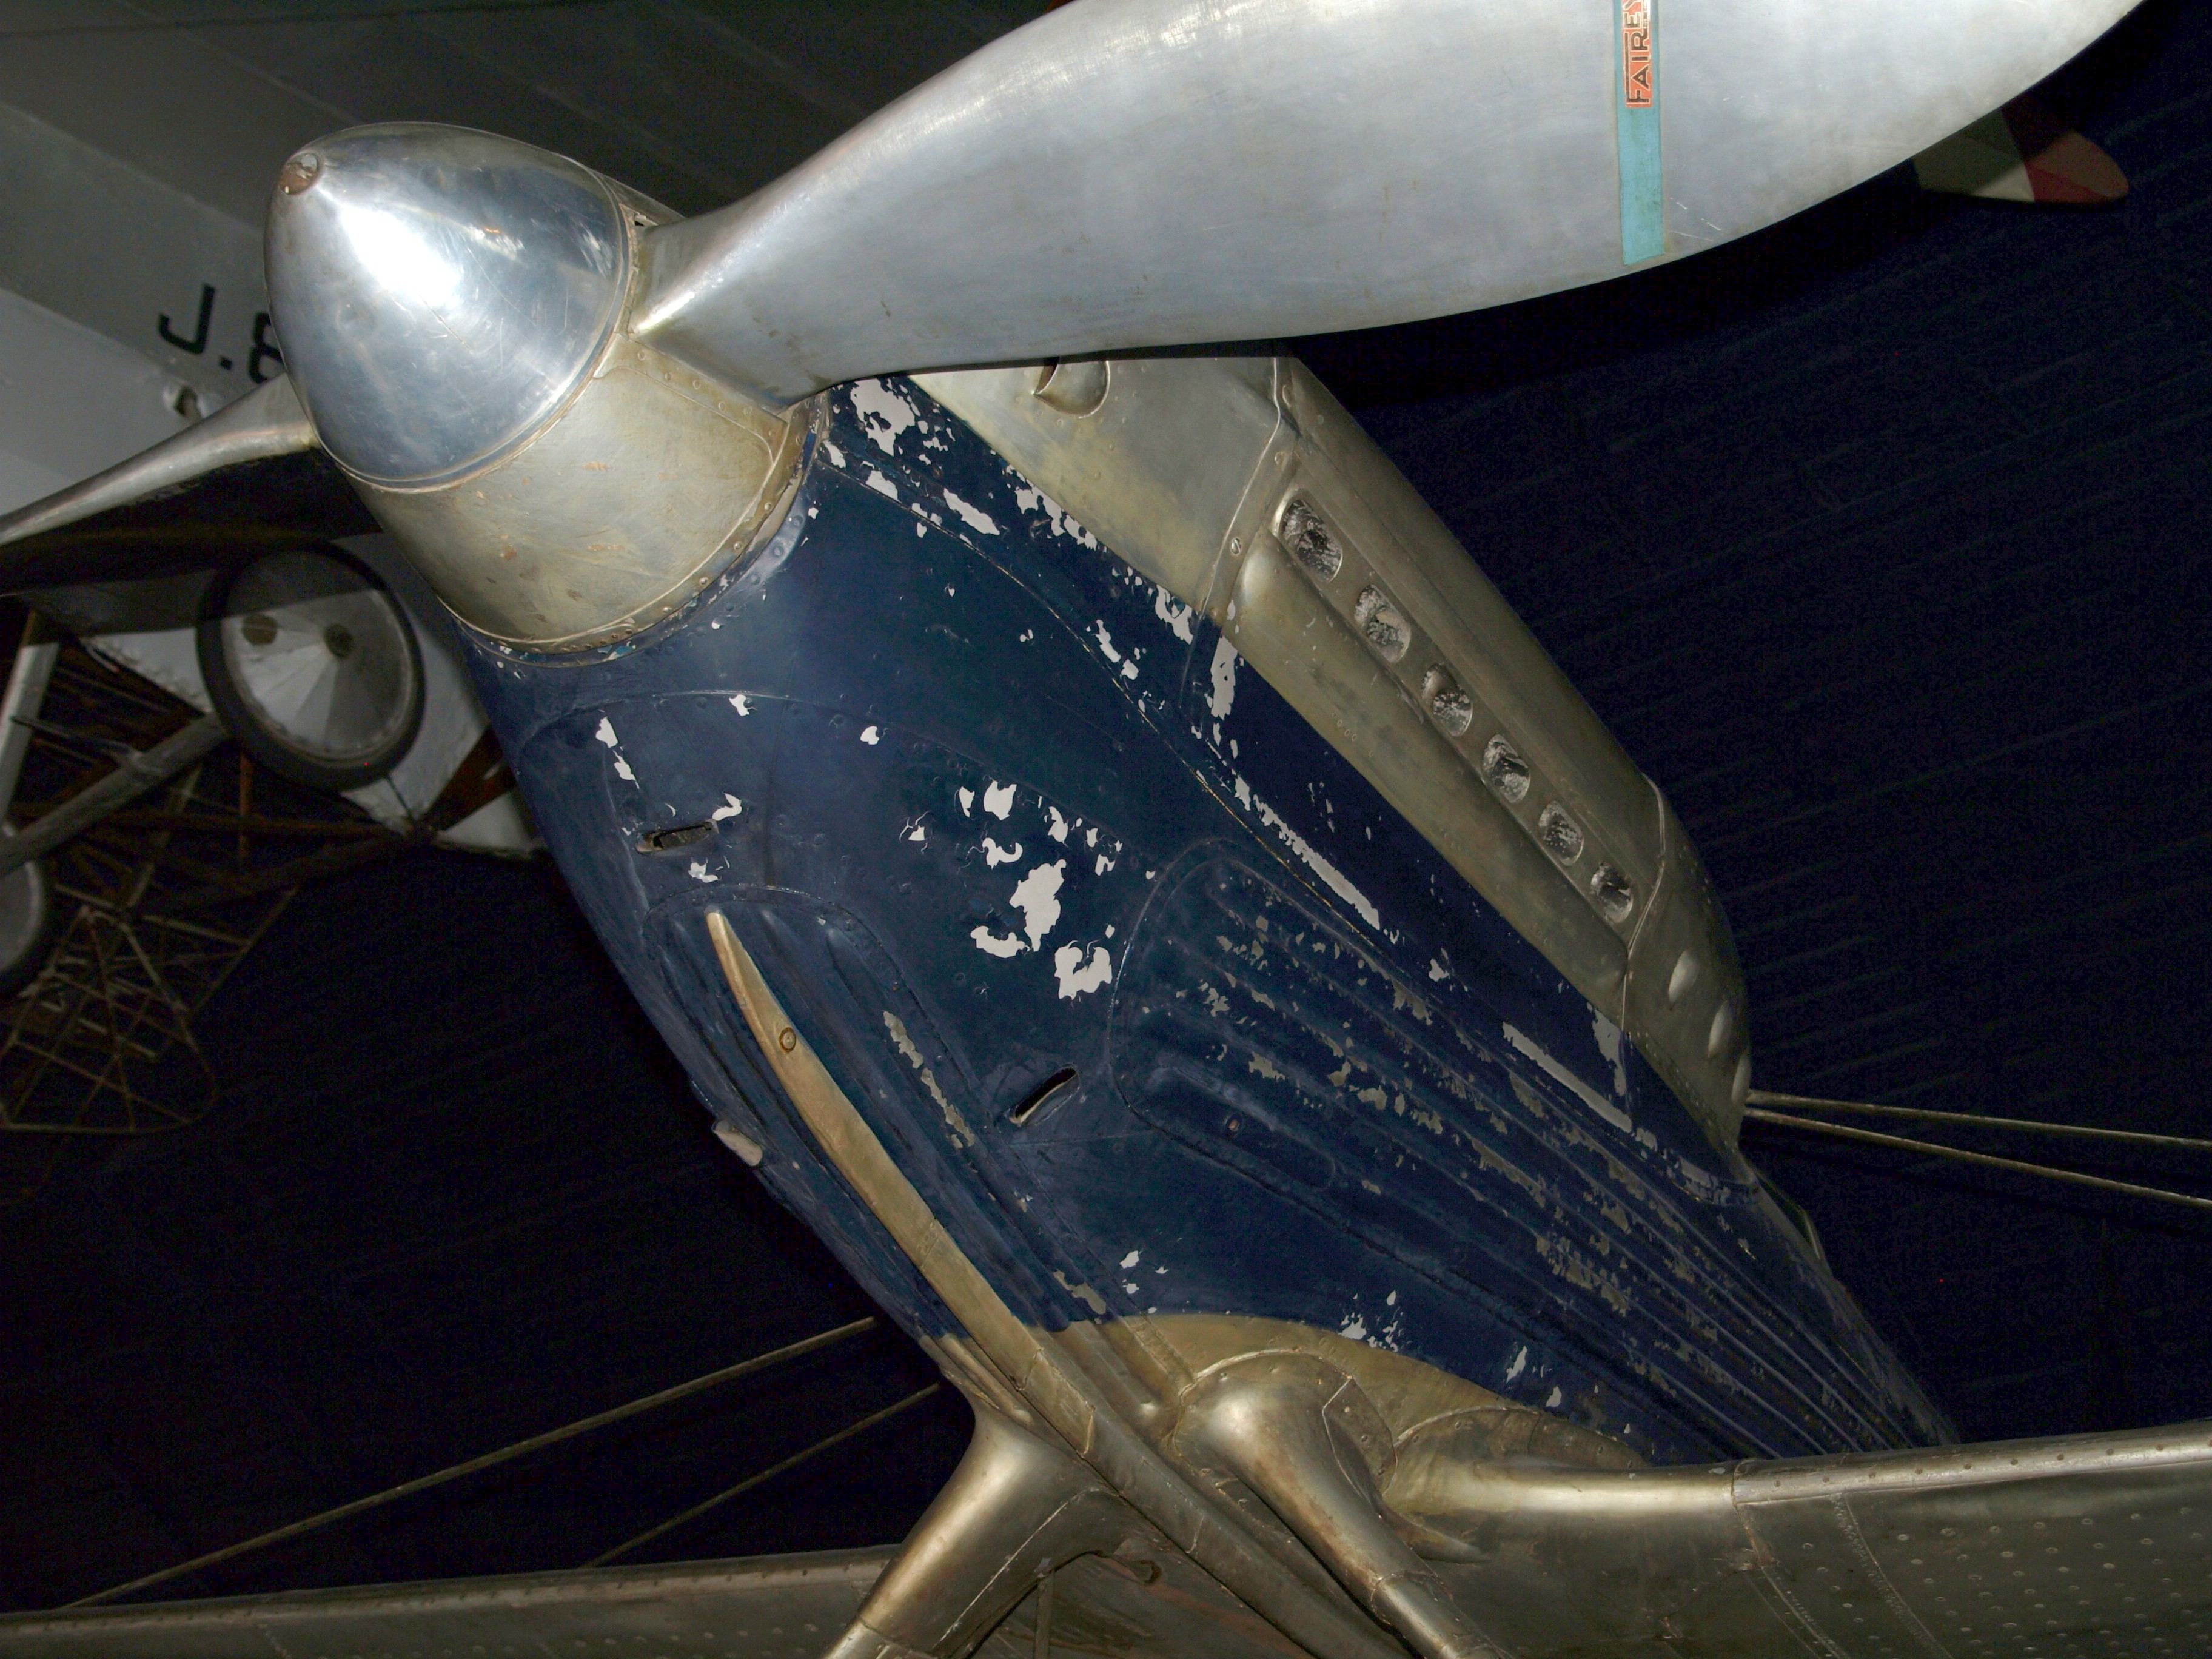 Supermarine_S6B_Science_Museum.jpg